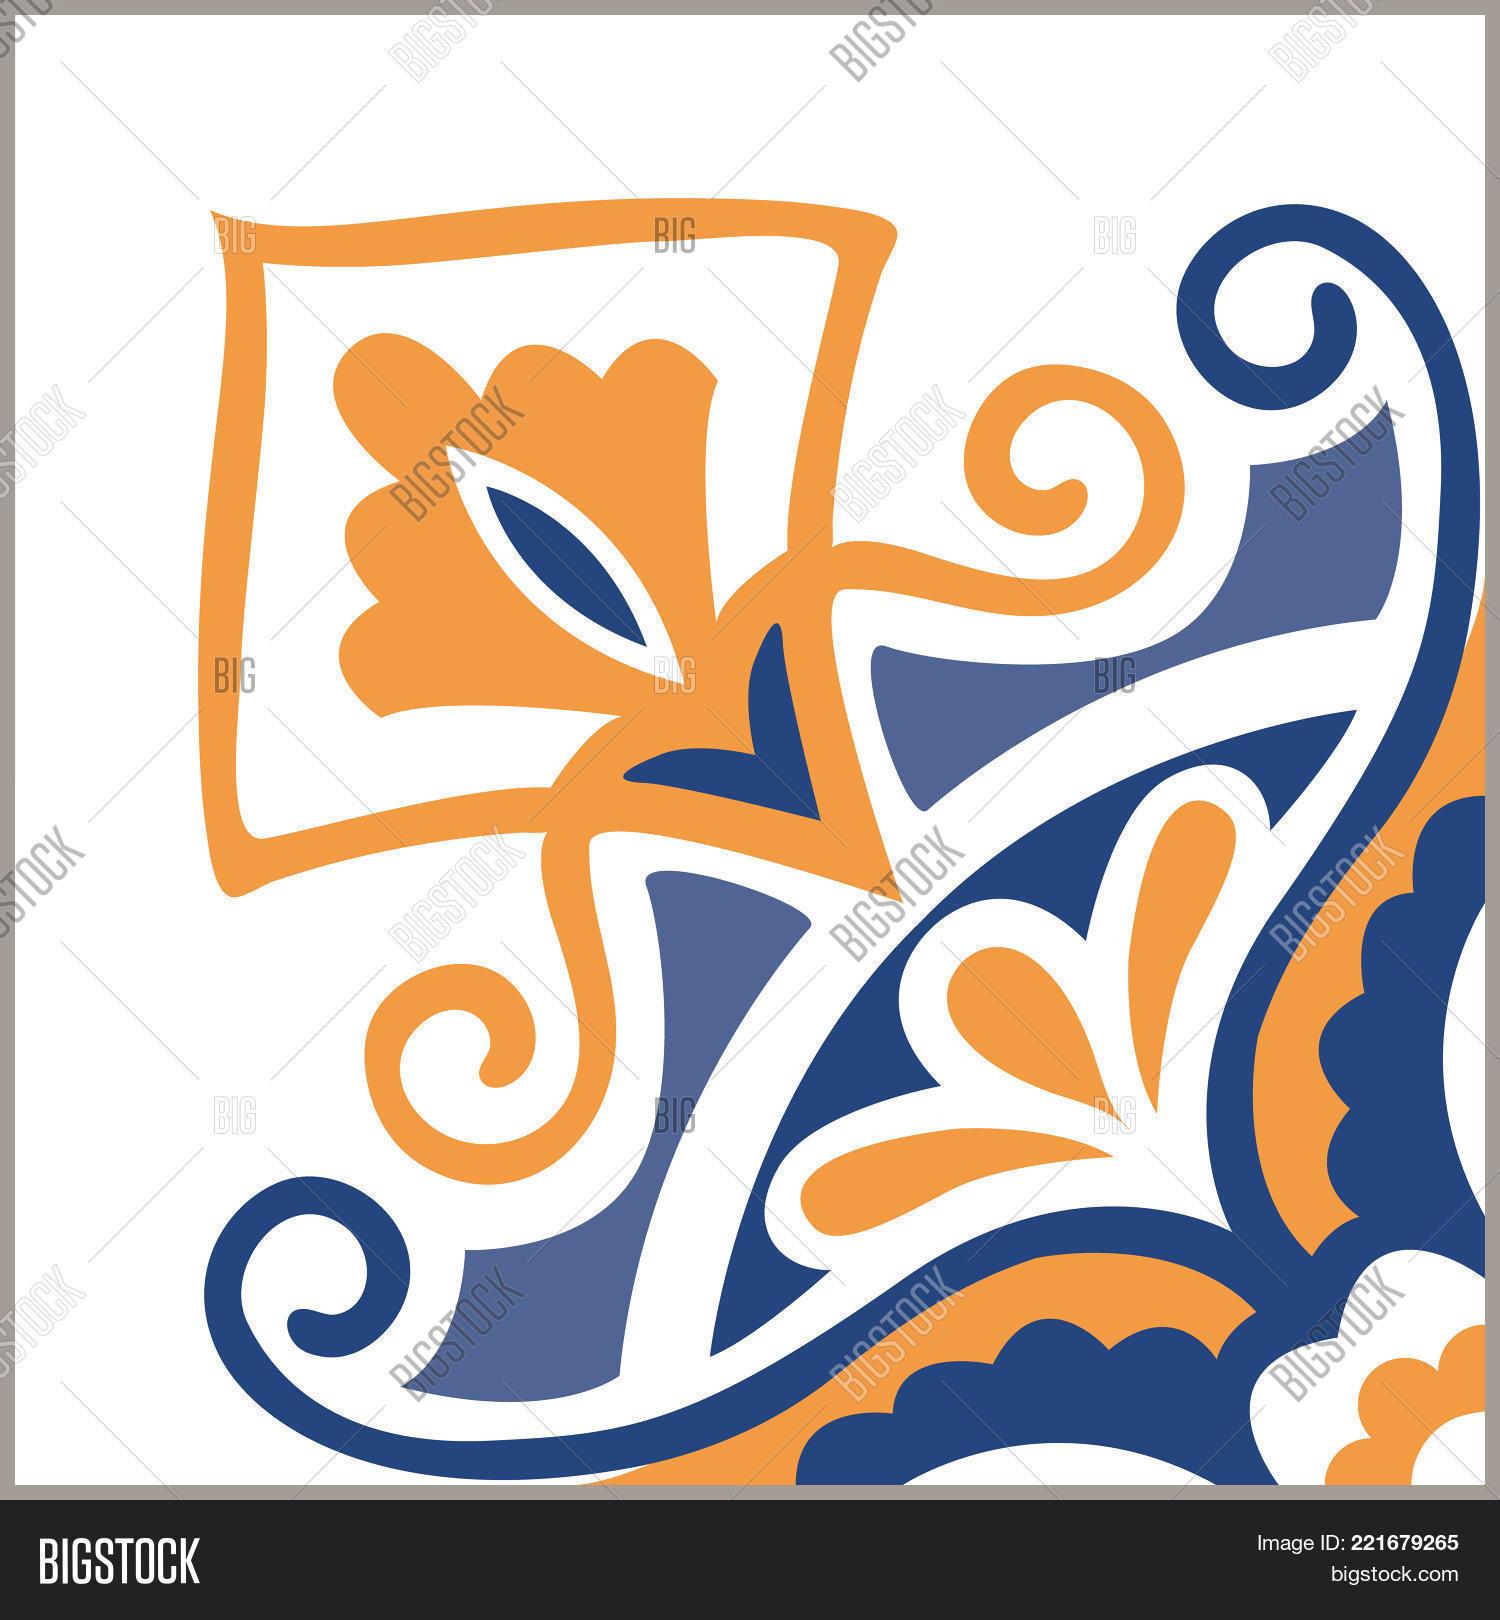 Portuguese Tiles Image & Photo (Free Trial) | Bigstock